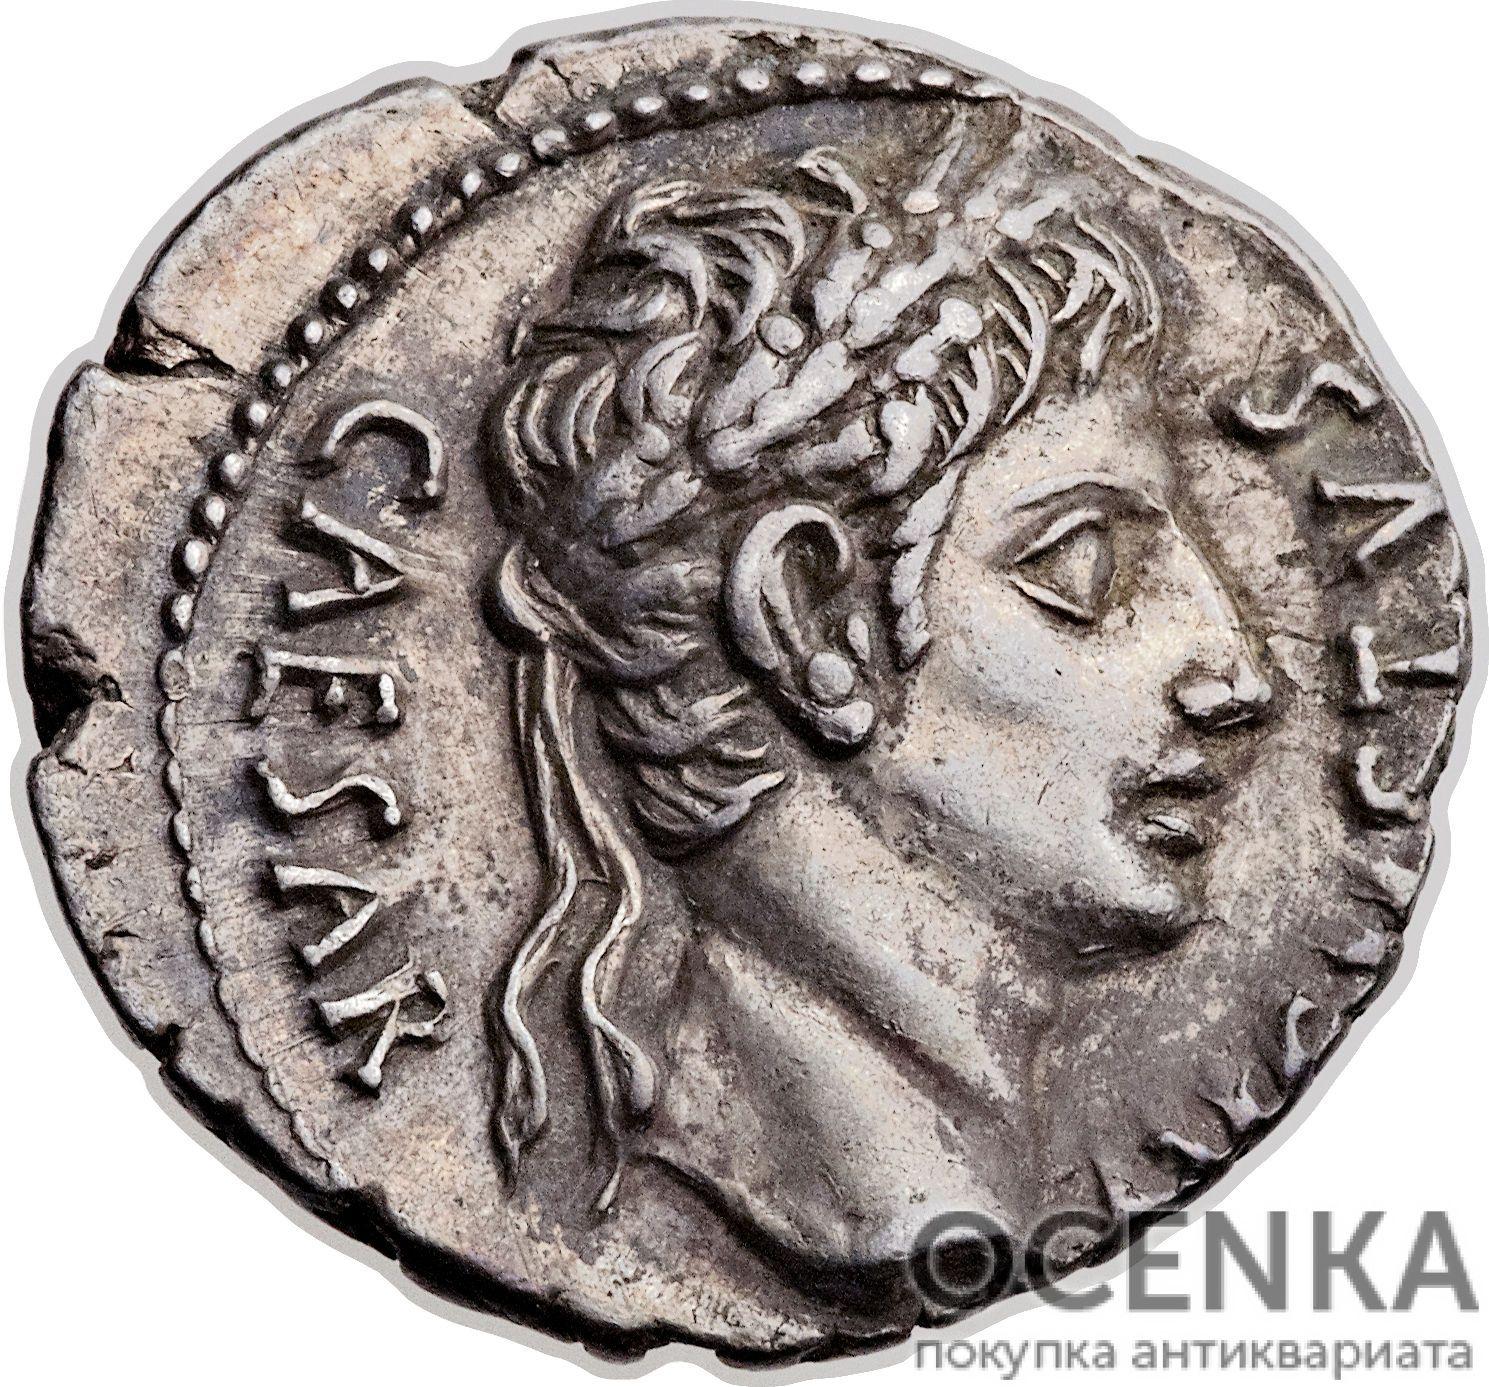 Серебряный Денарий Тиберия Юлия Цезаря Августа, 14-37 год